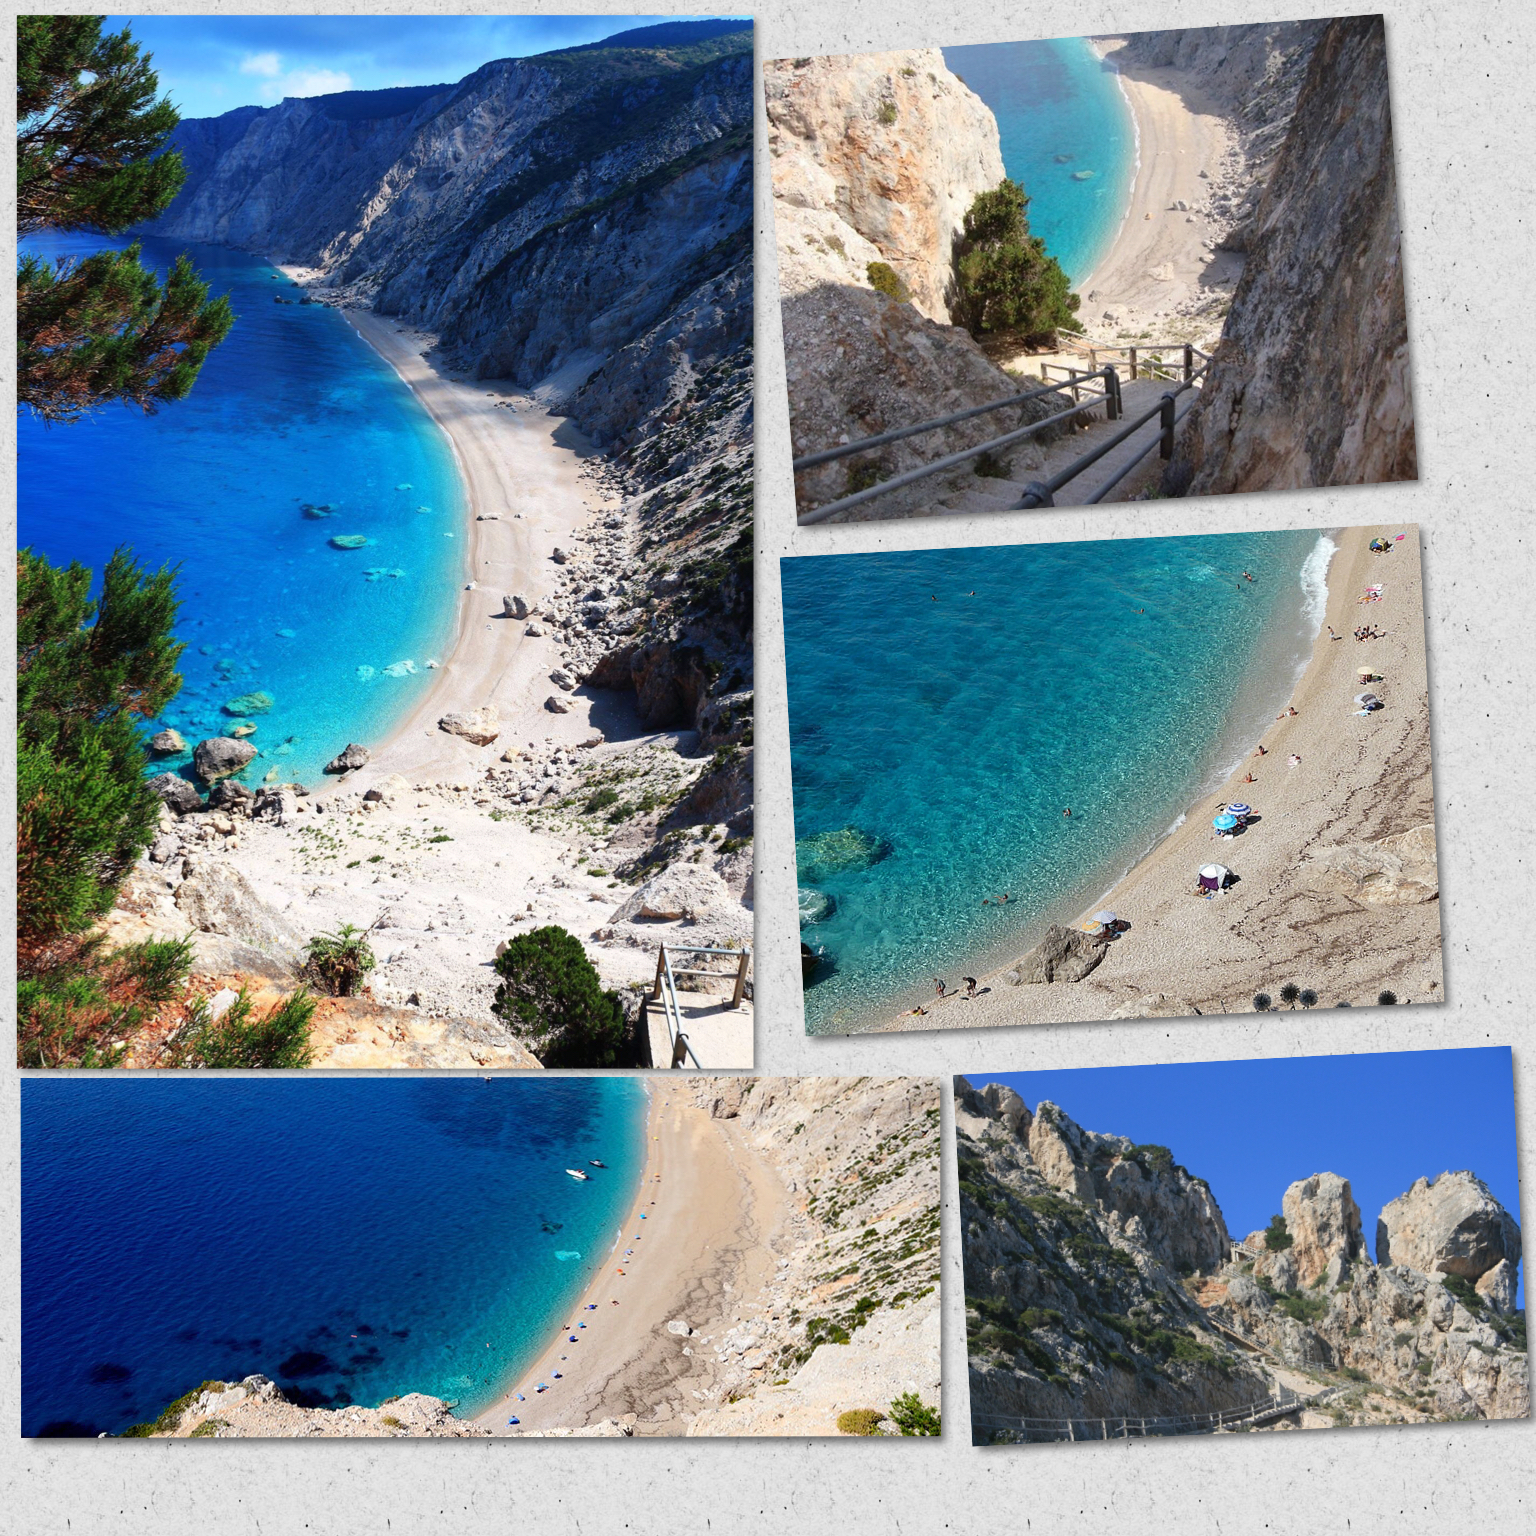 Platie Ammos Beach,Cephalonia